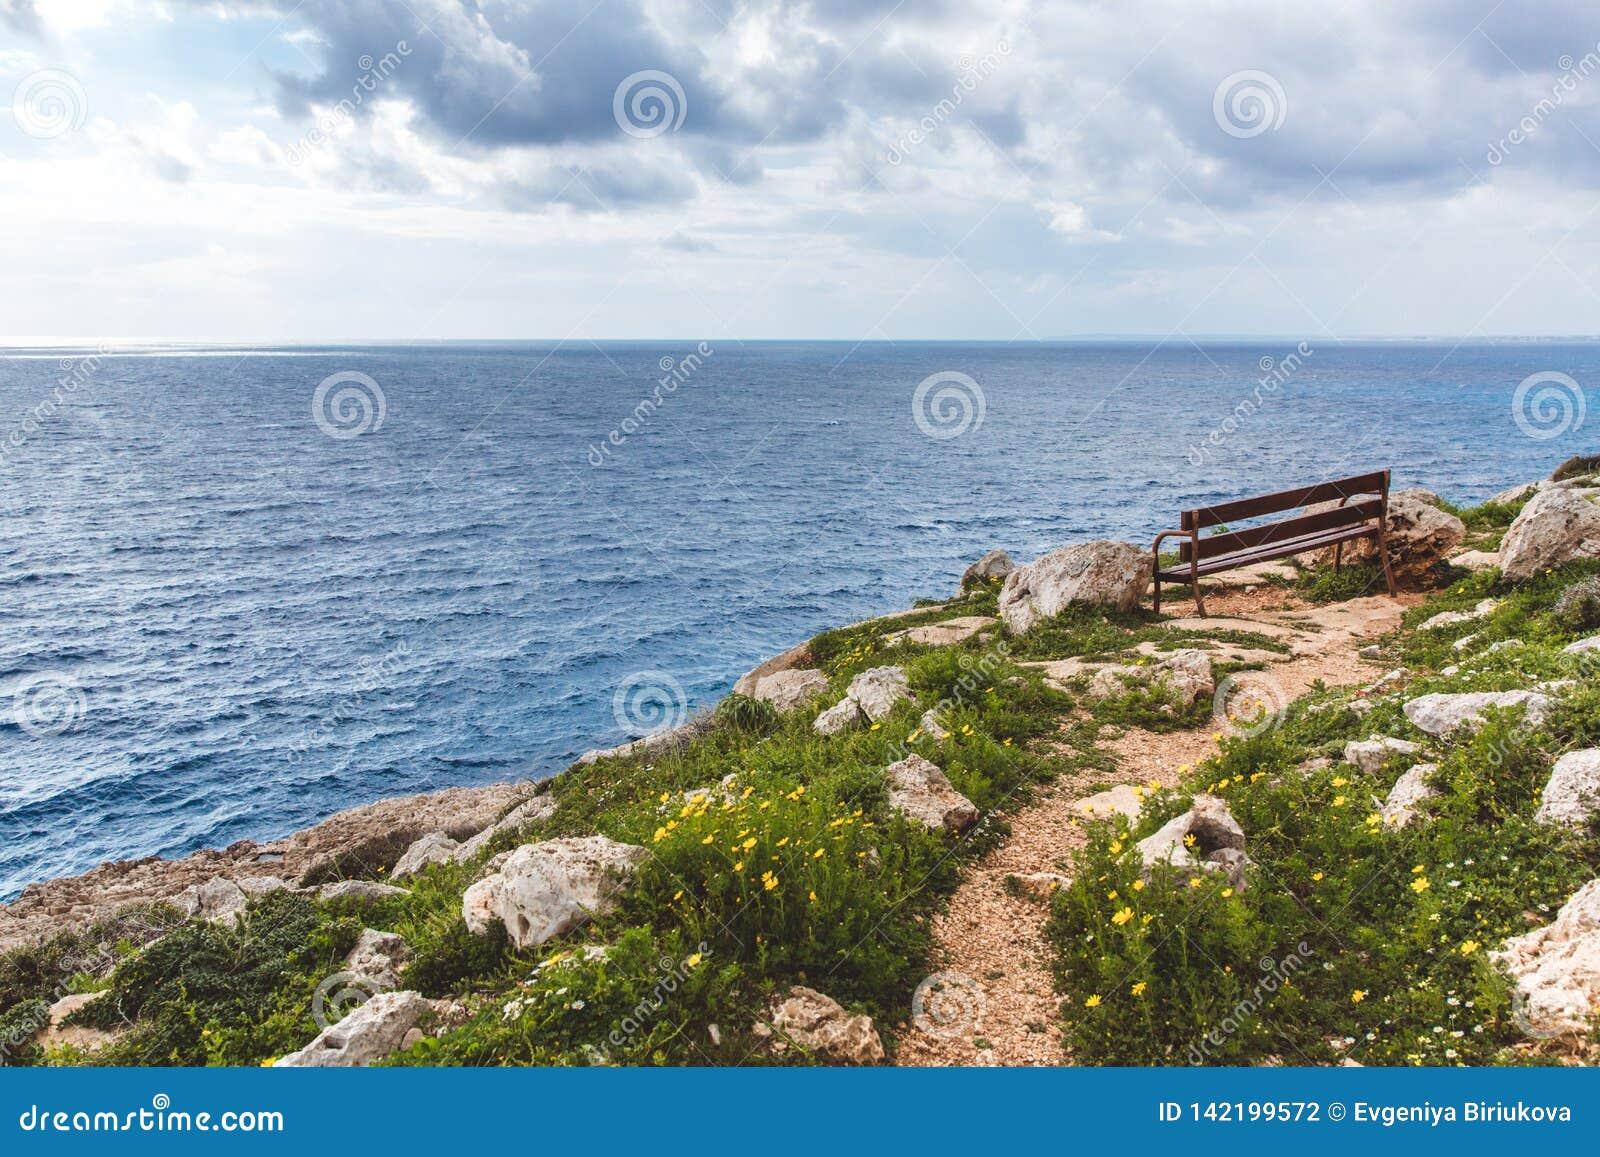 Gabarits sur le bord de la mer Belle vallée par la mer Paysage marin en Chypre Ayia Napa